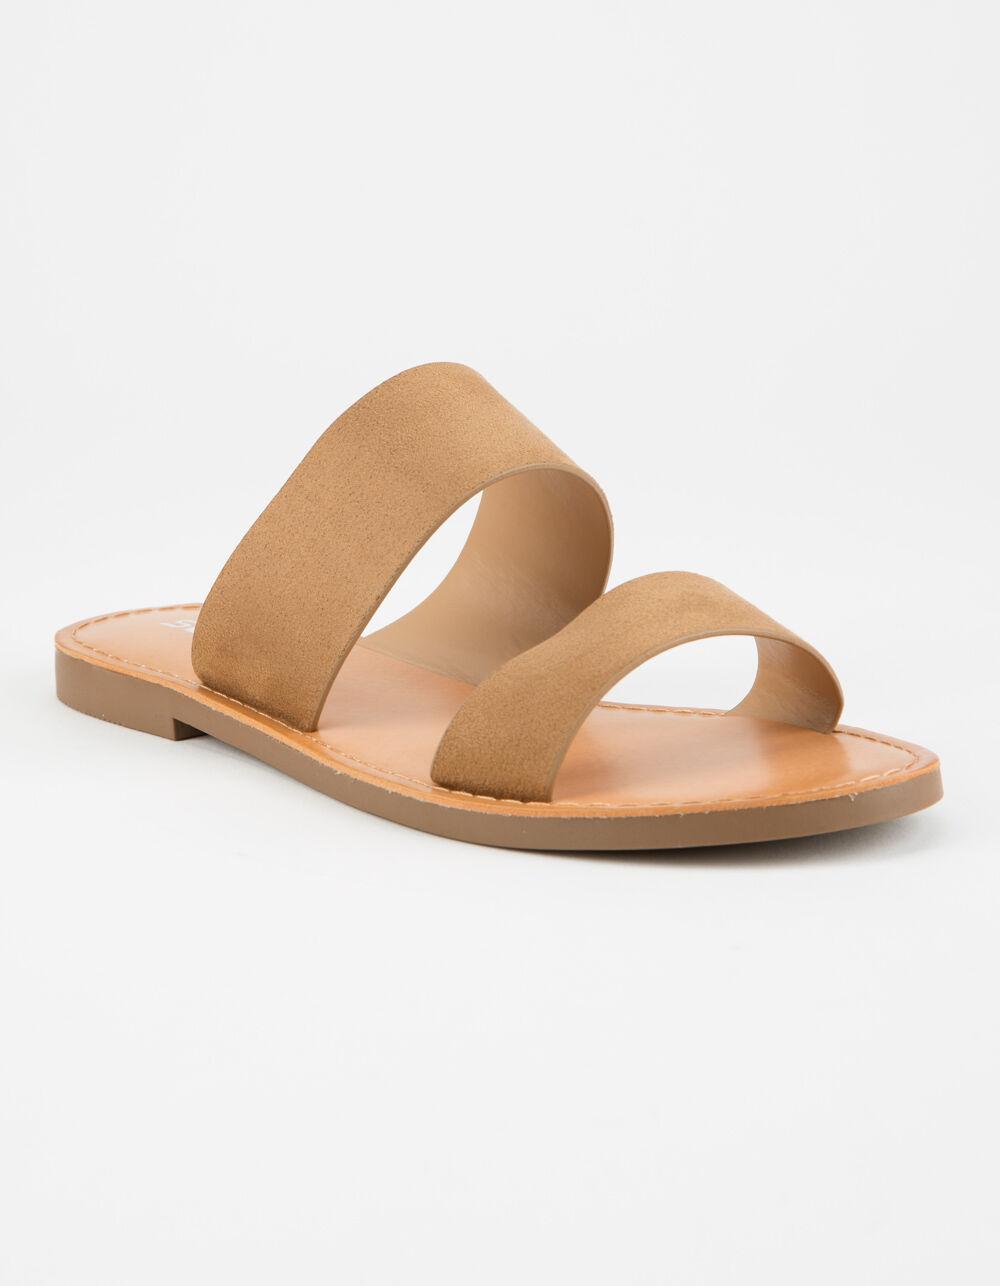 SODA Double Strap Tan Sandals